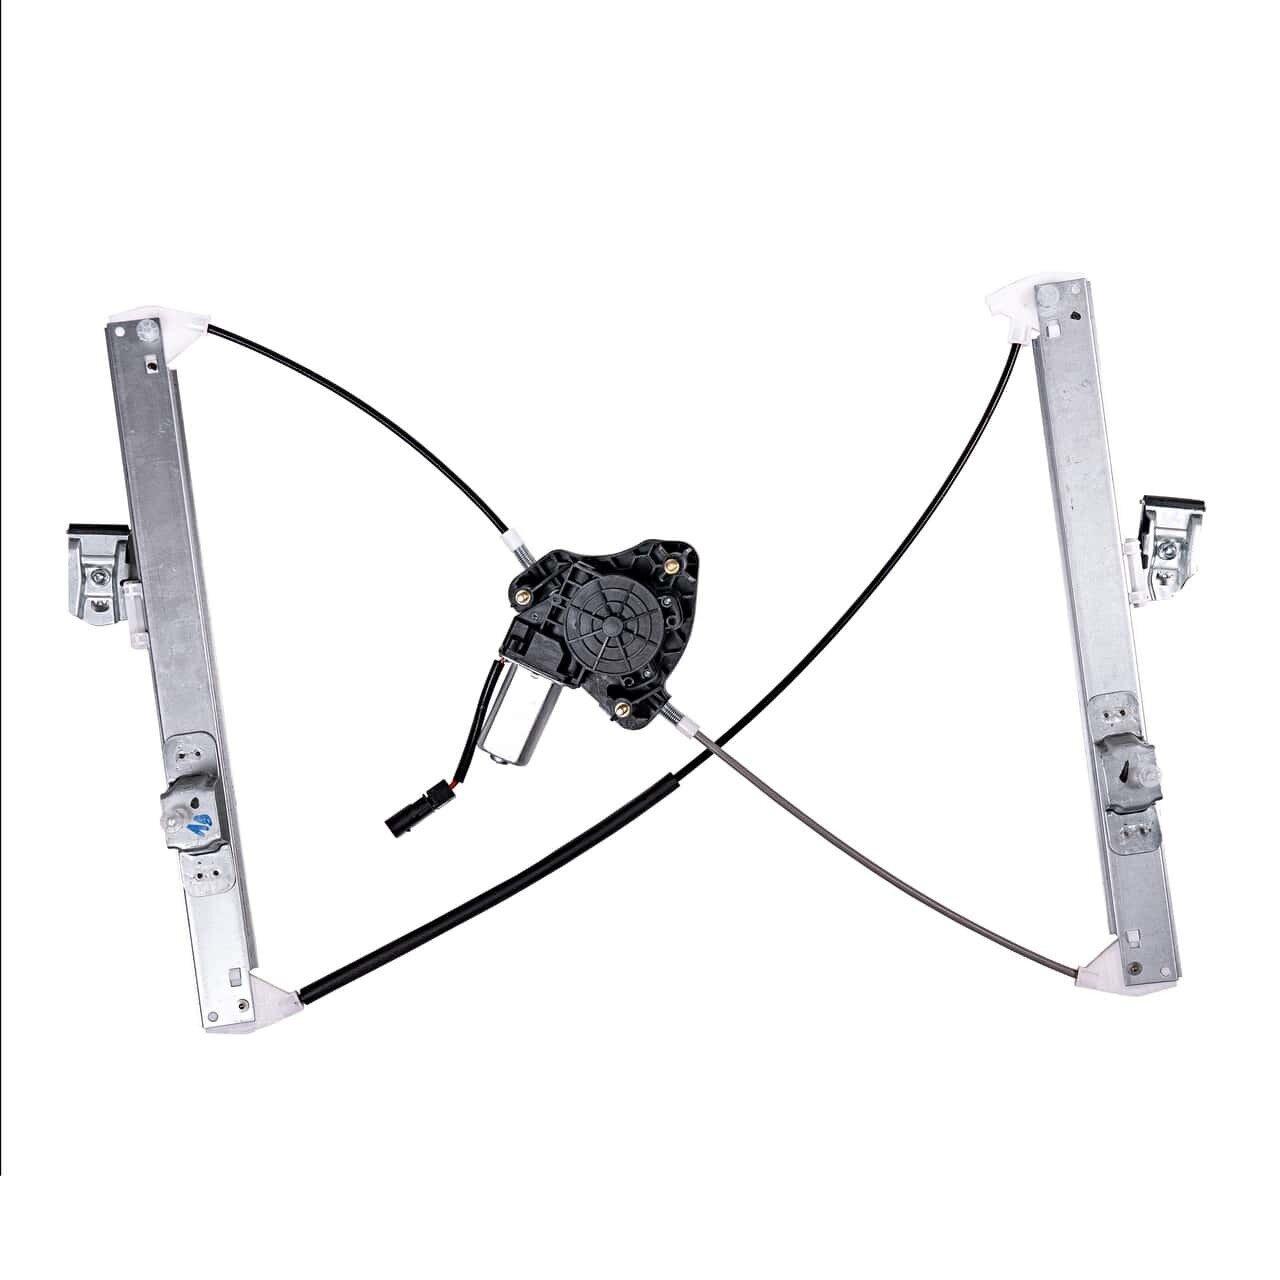 Стеклоподъемник LADA 4x4 Urban передний левый SAV электрический | Ningbo Stone